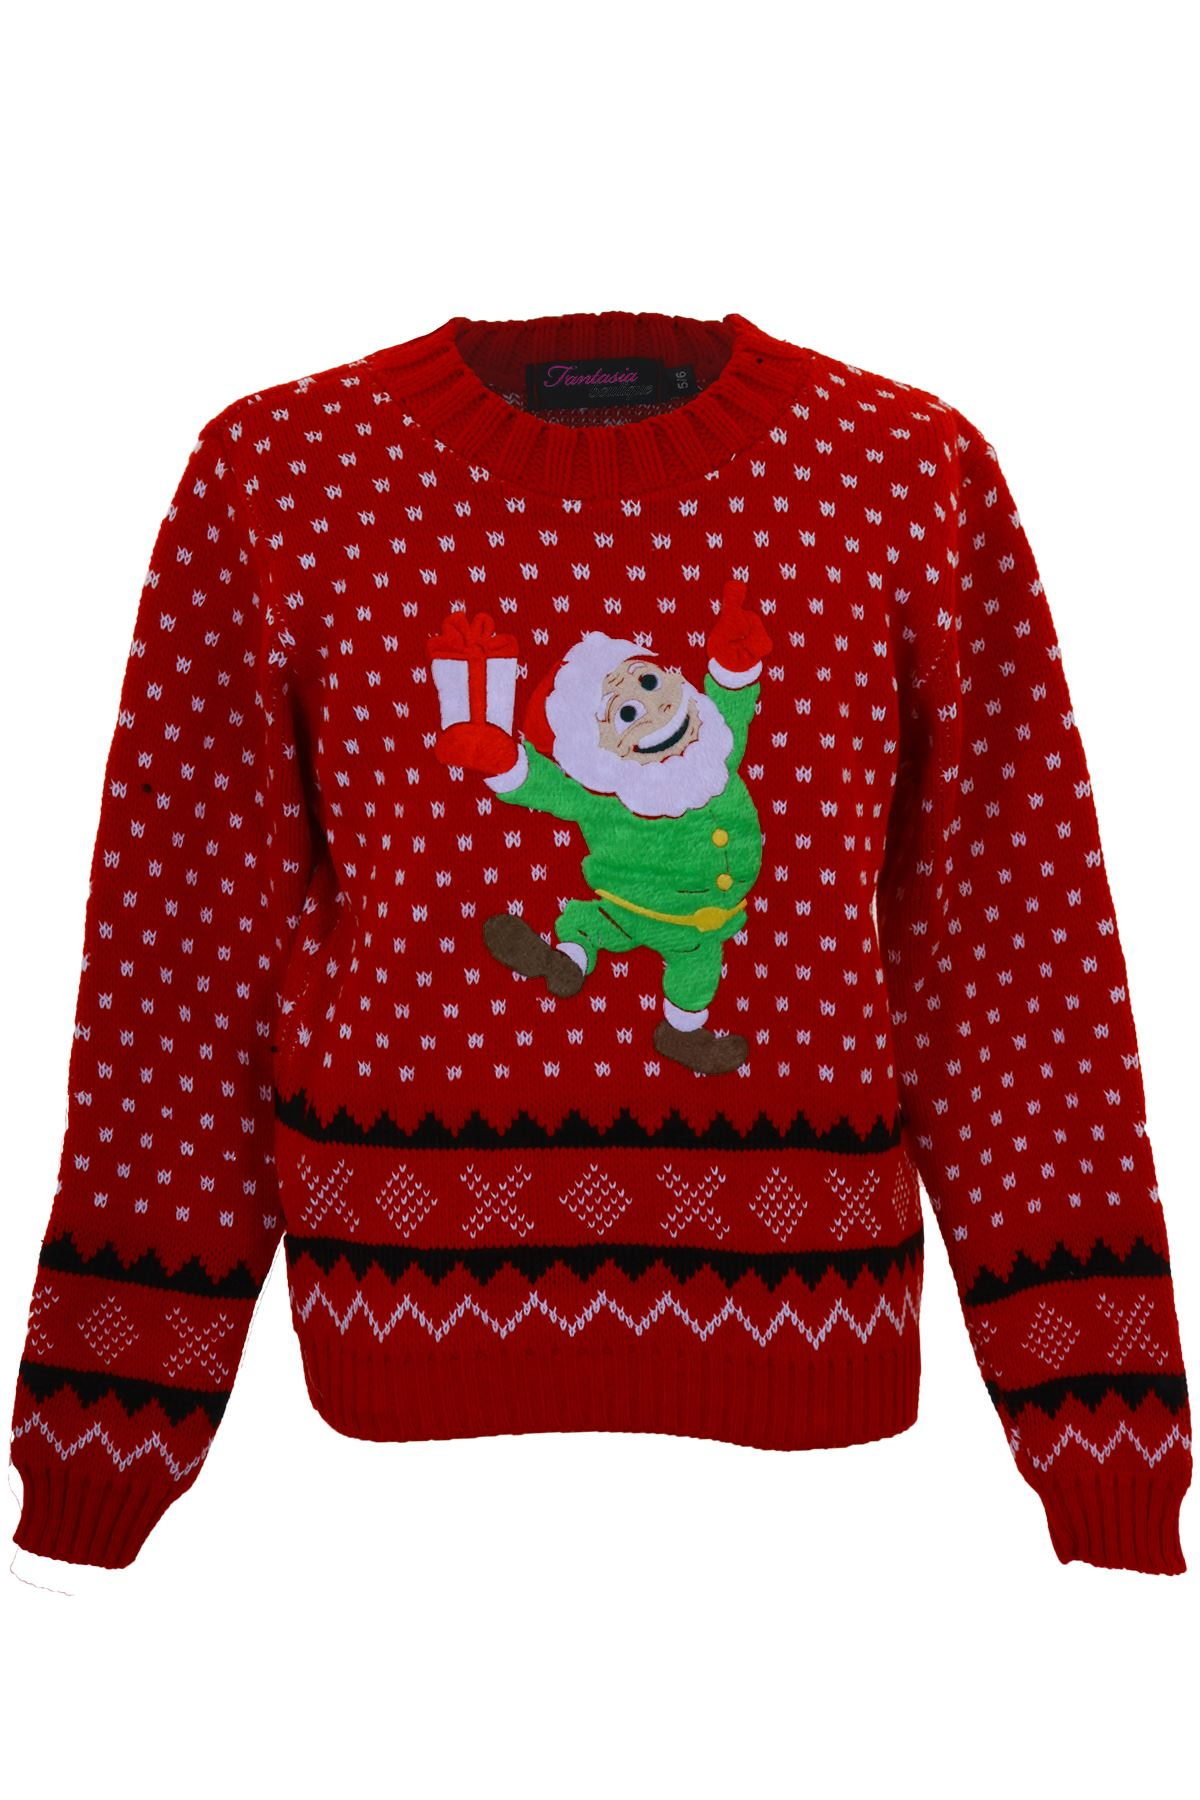 Knitting Pattern For Olaf Jumper : Girls Olaf Minion Reindeer Rudolf Santa Childrens Knitted ...